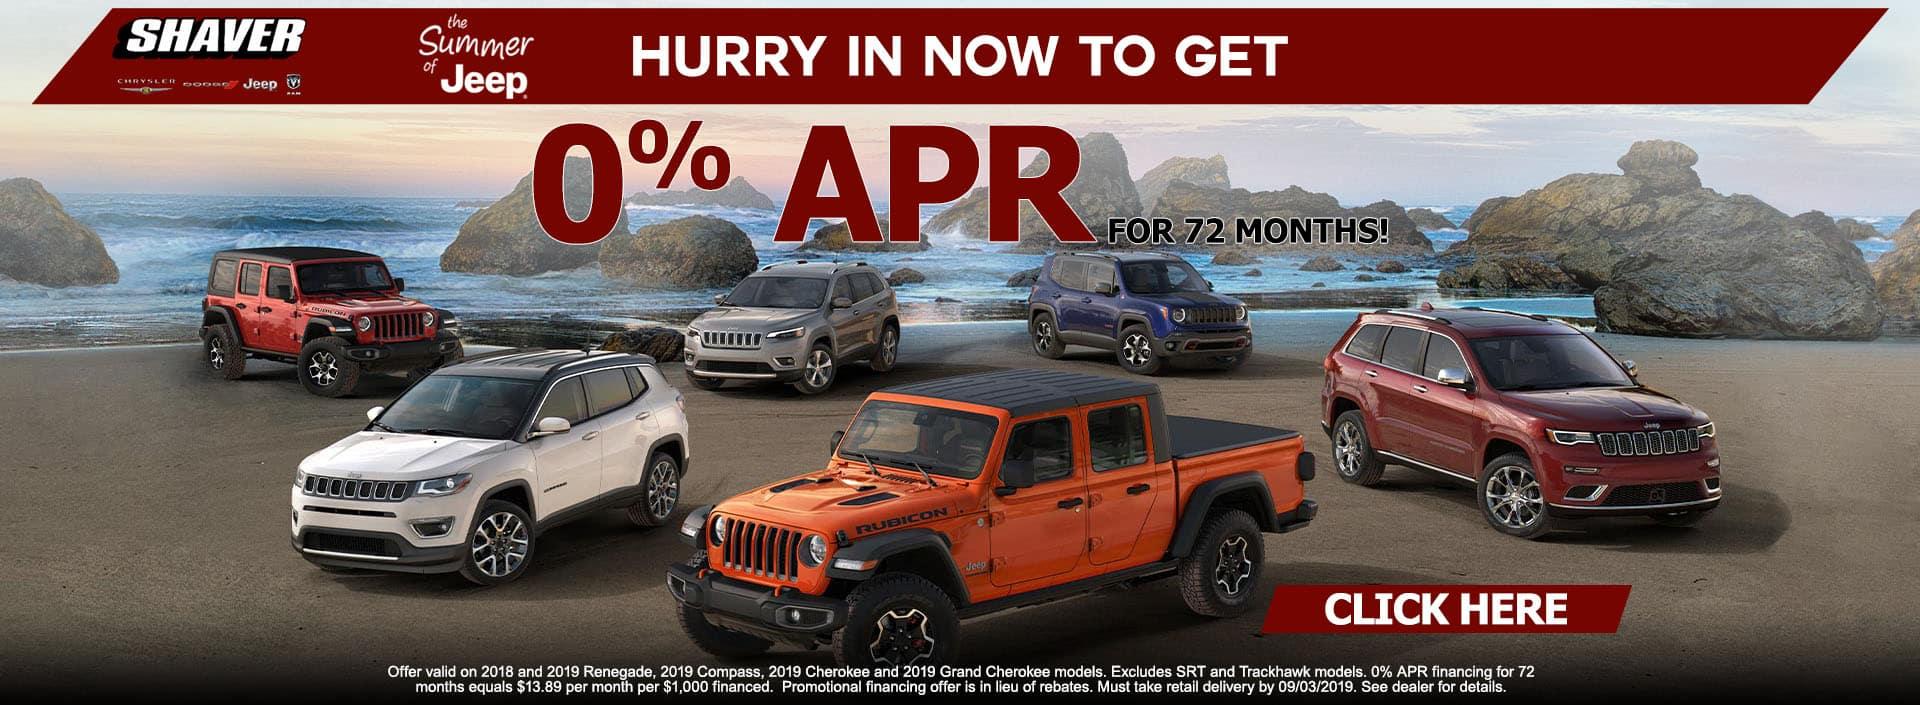 Shaver CDJR | Dodge Chrysler Jeep RAM Dealer in Thousand Oaks, CA